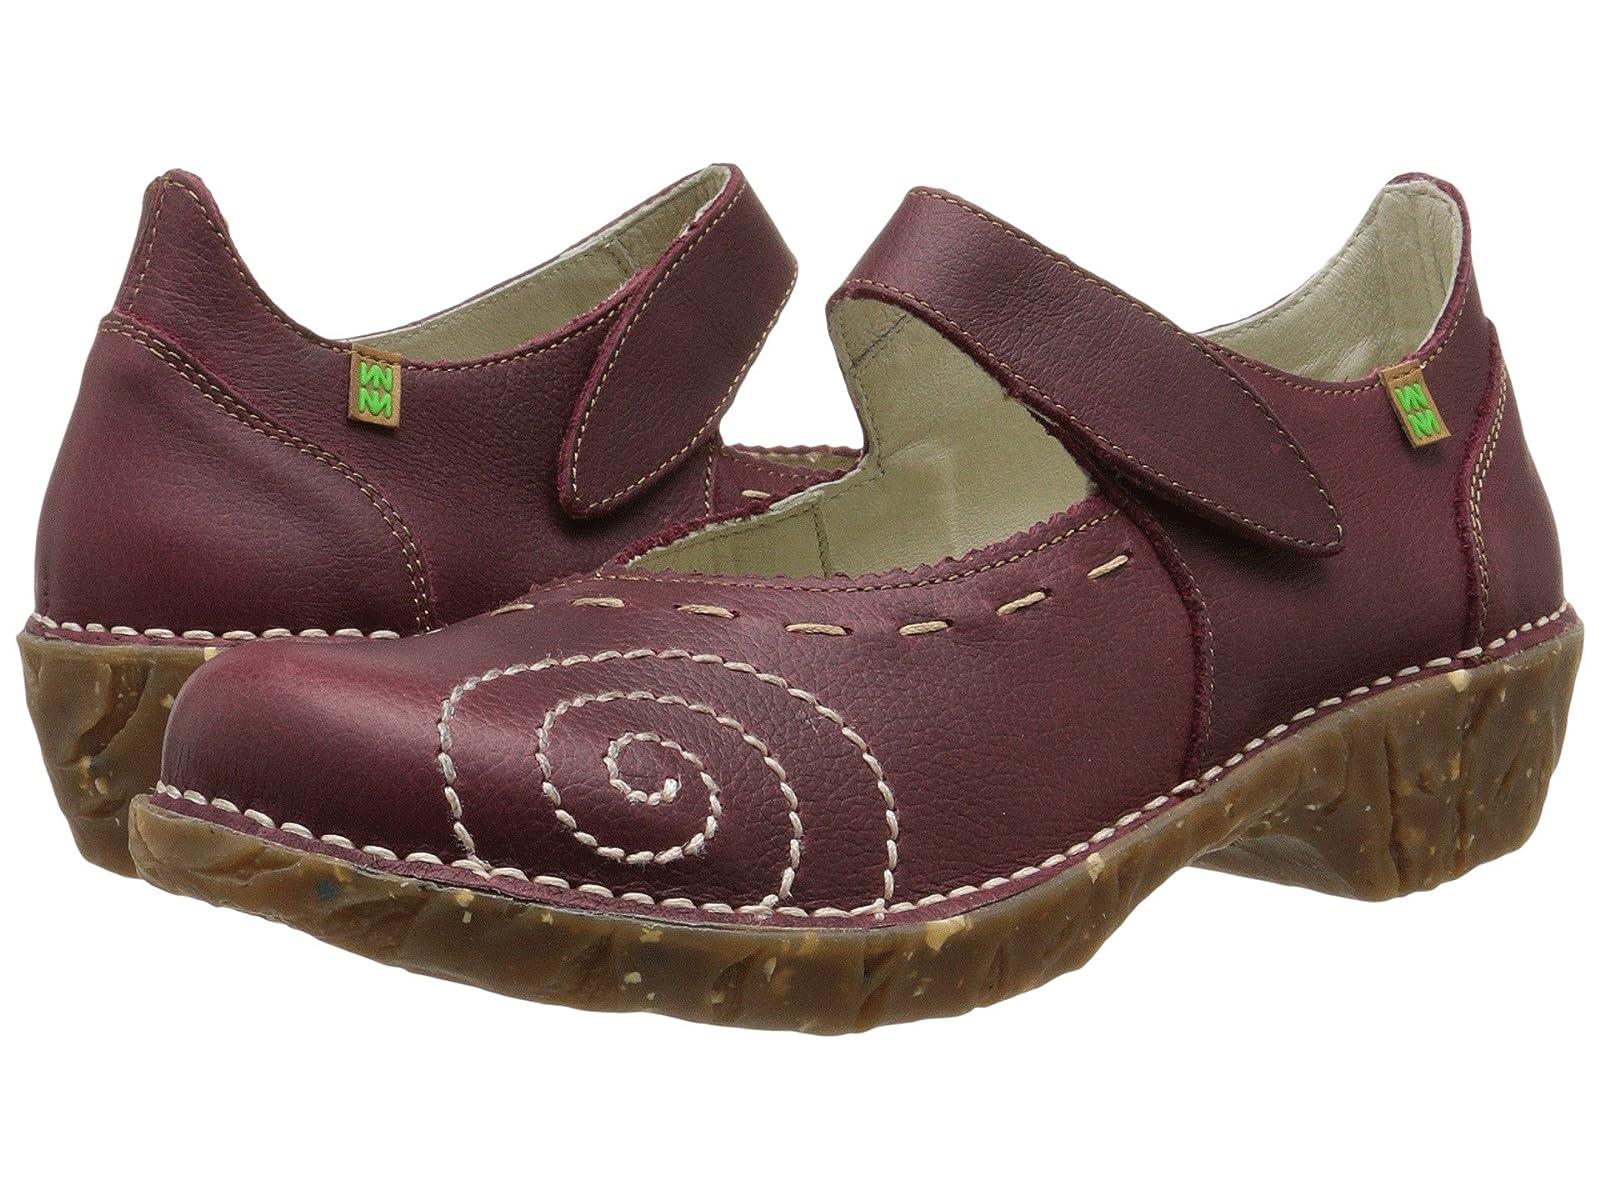 El Naturalista Yggdrasil N095Cheap and distinctive eye-catching shoes